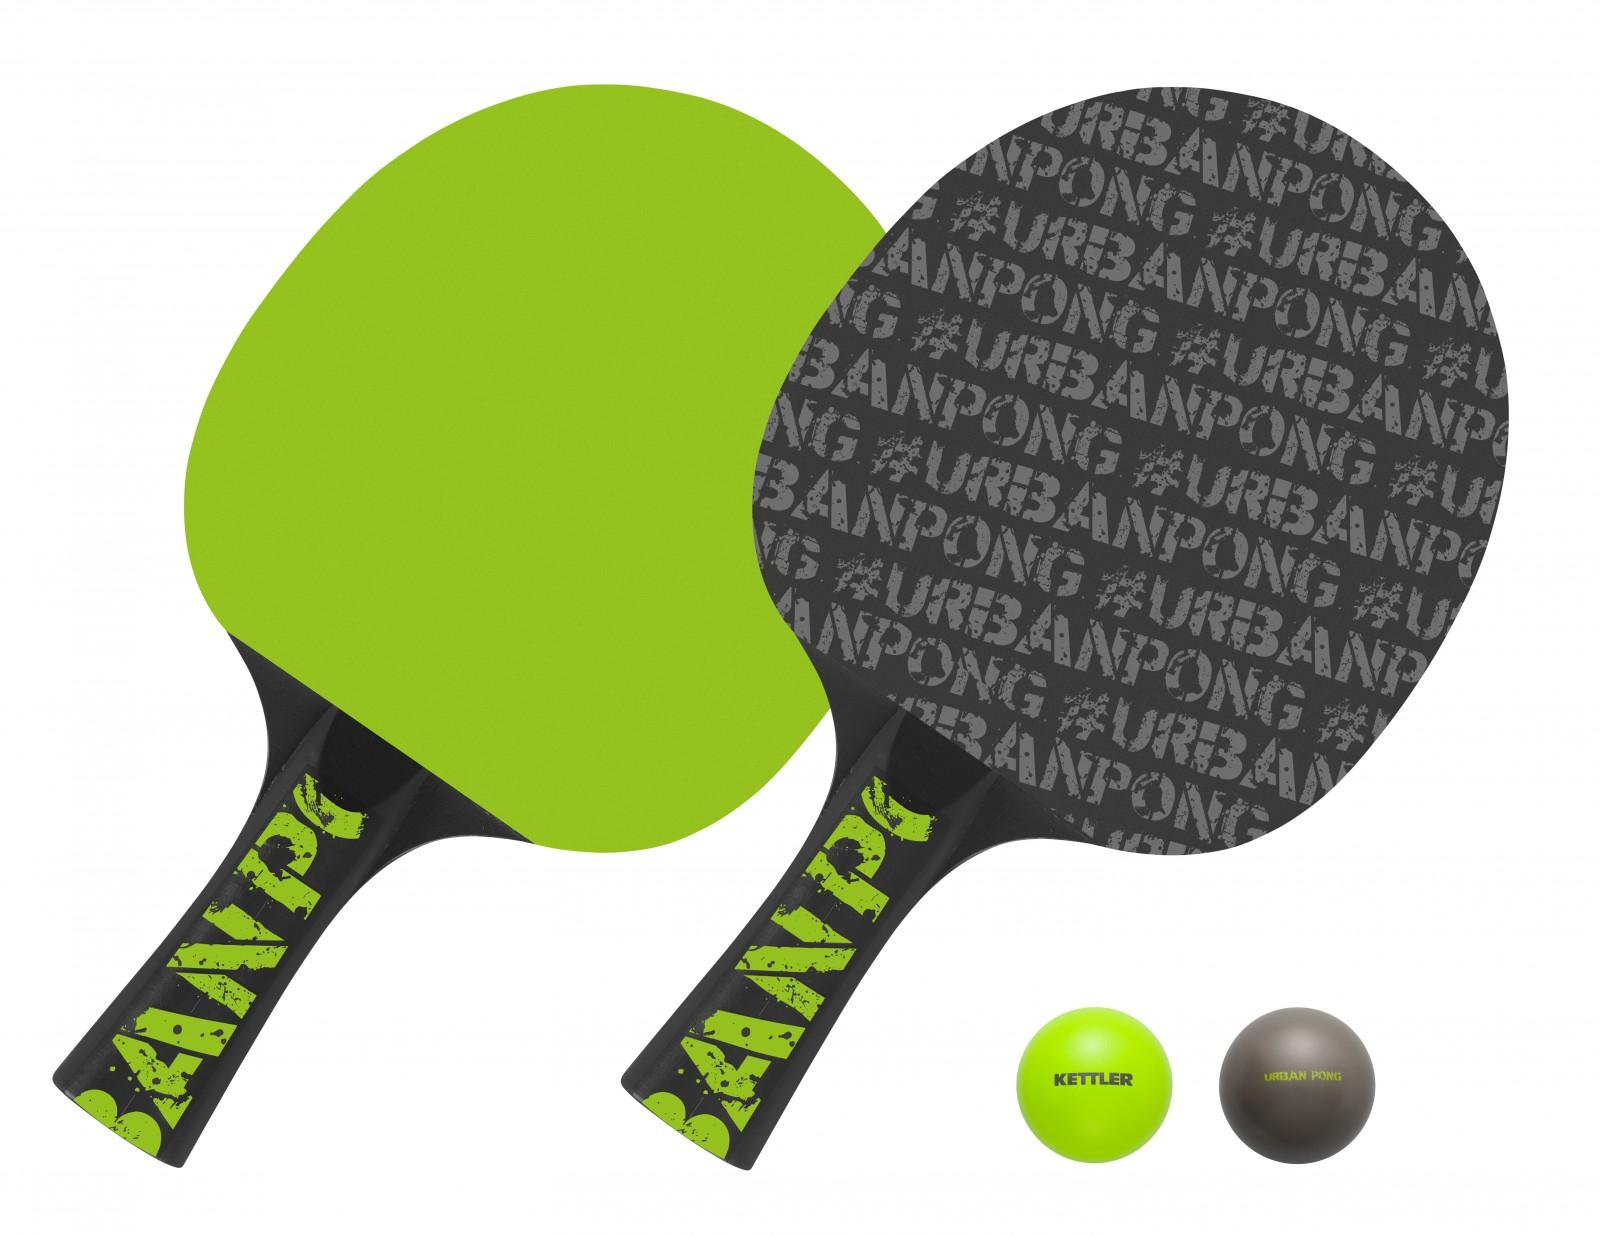 kettler tischtennisschl ger set urban pong g nstig kaufen. Black Bedroom Furniture Sets. Home Design Ideas